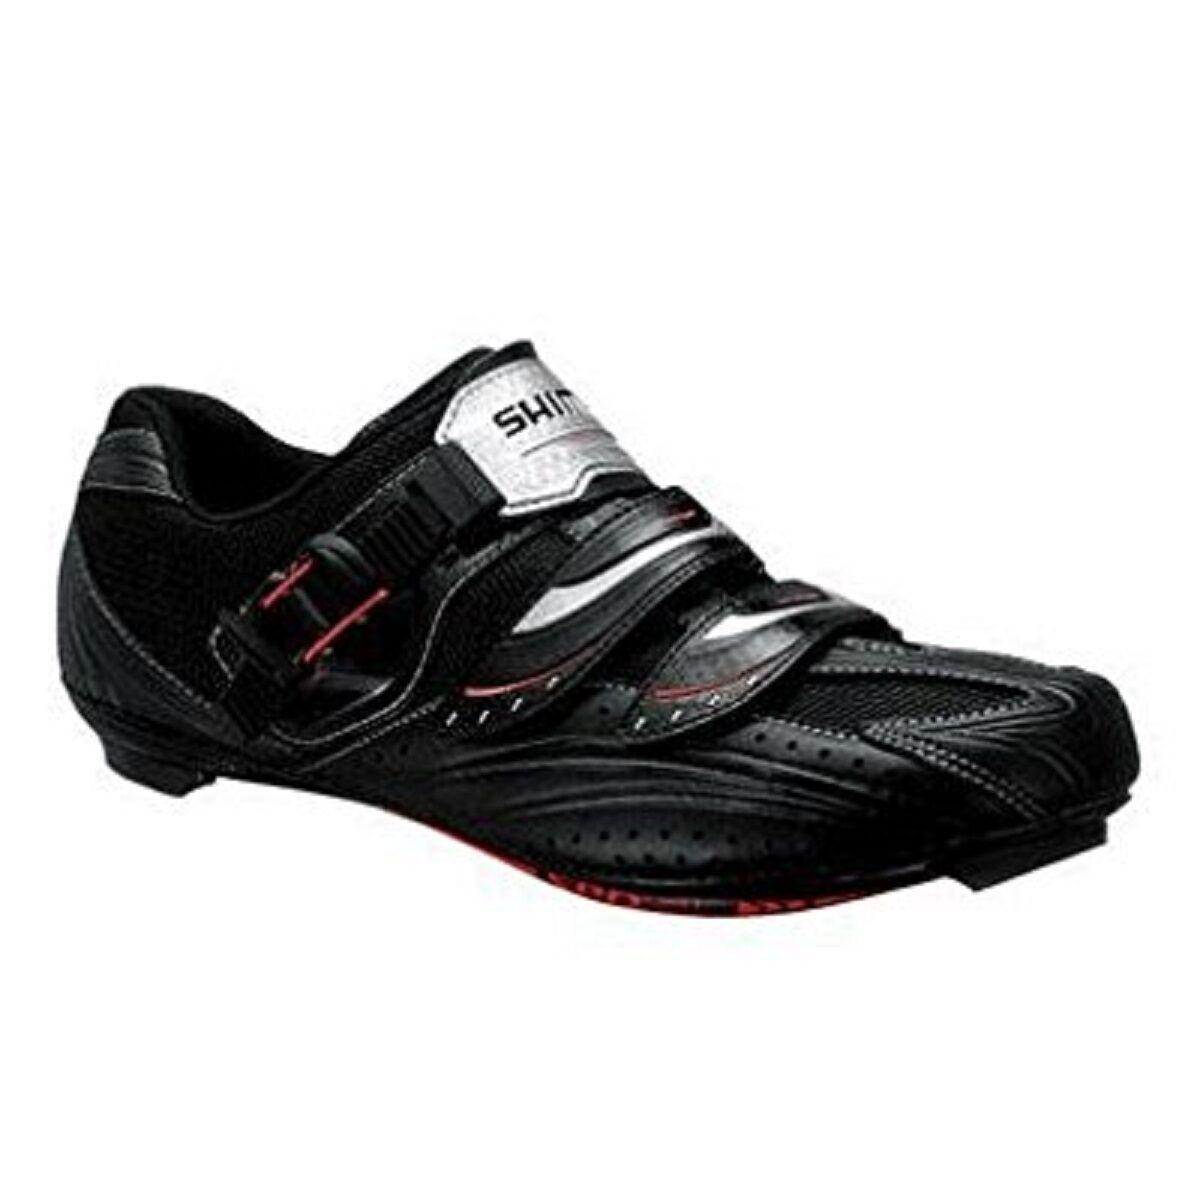 Shimano Men's Pro Tour Road Cycling shoes - SH-R106L -  Size 42 EU, 8.3 US